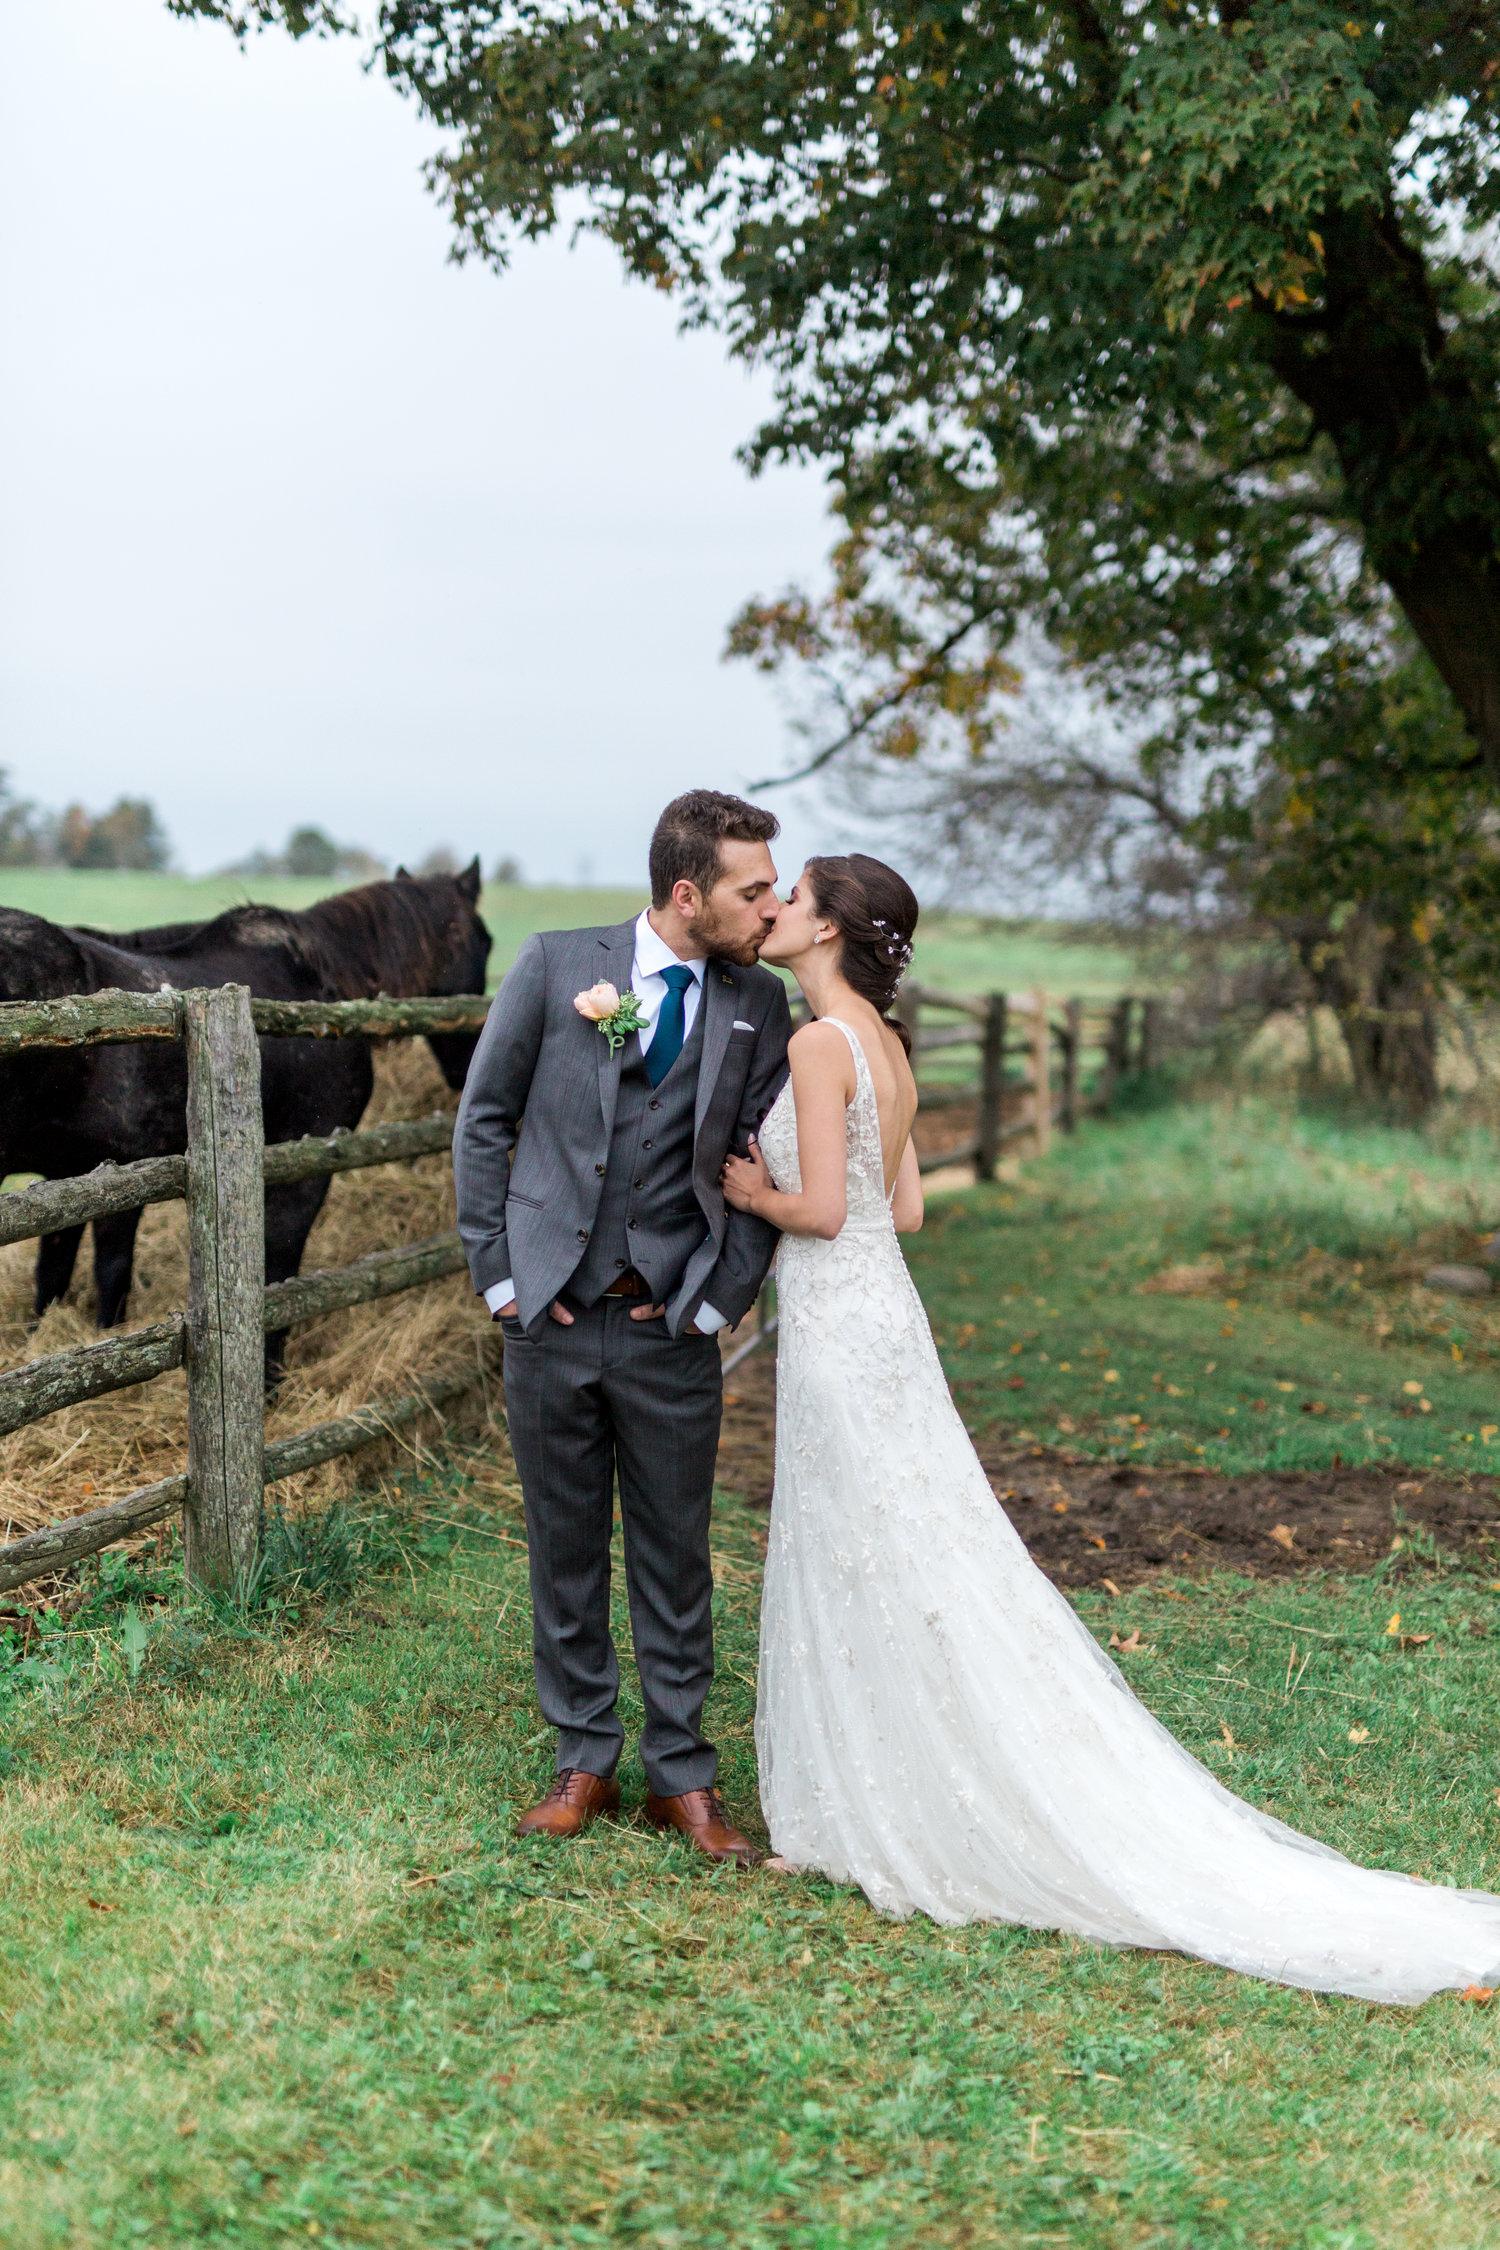 Amir-Golbazi-Danielle-Giroux-Photography_Toronto-Wedding_Cedarwood_Rachel-Paul_561.jpg